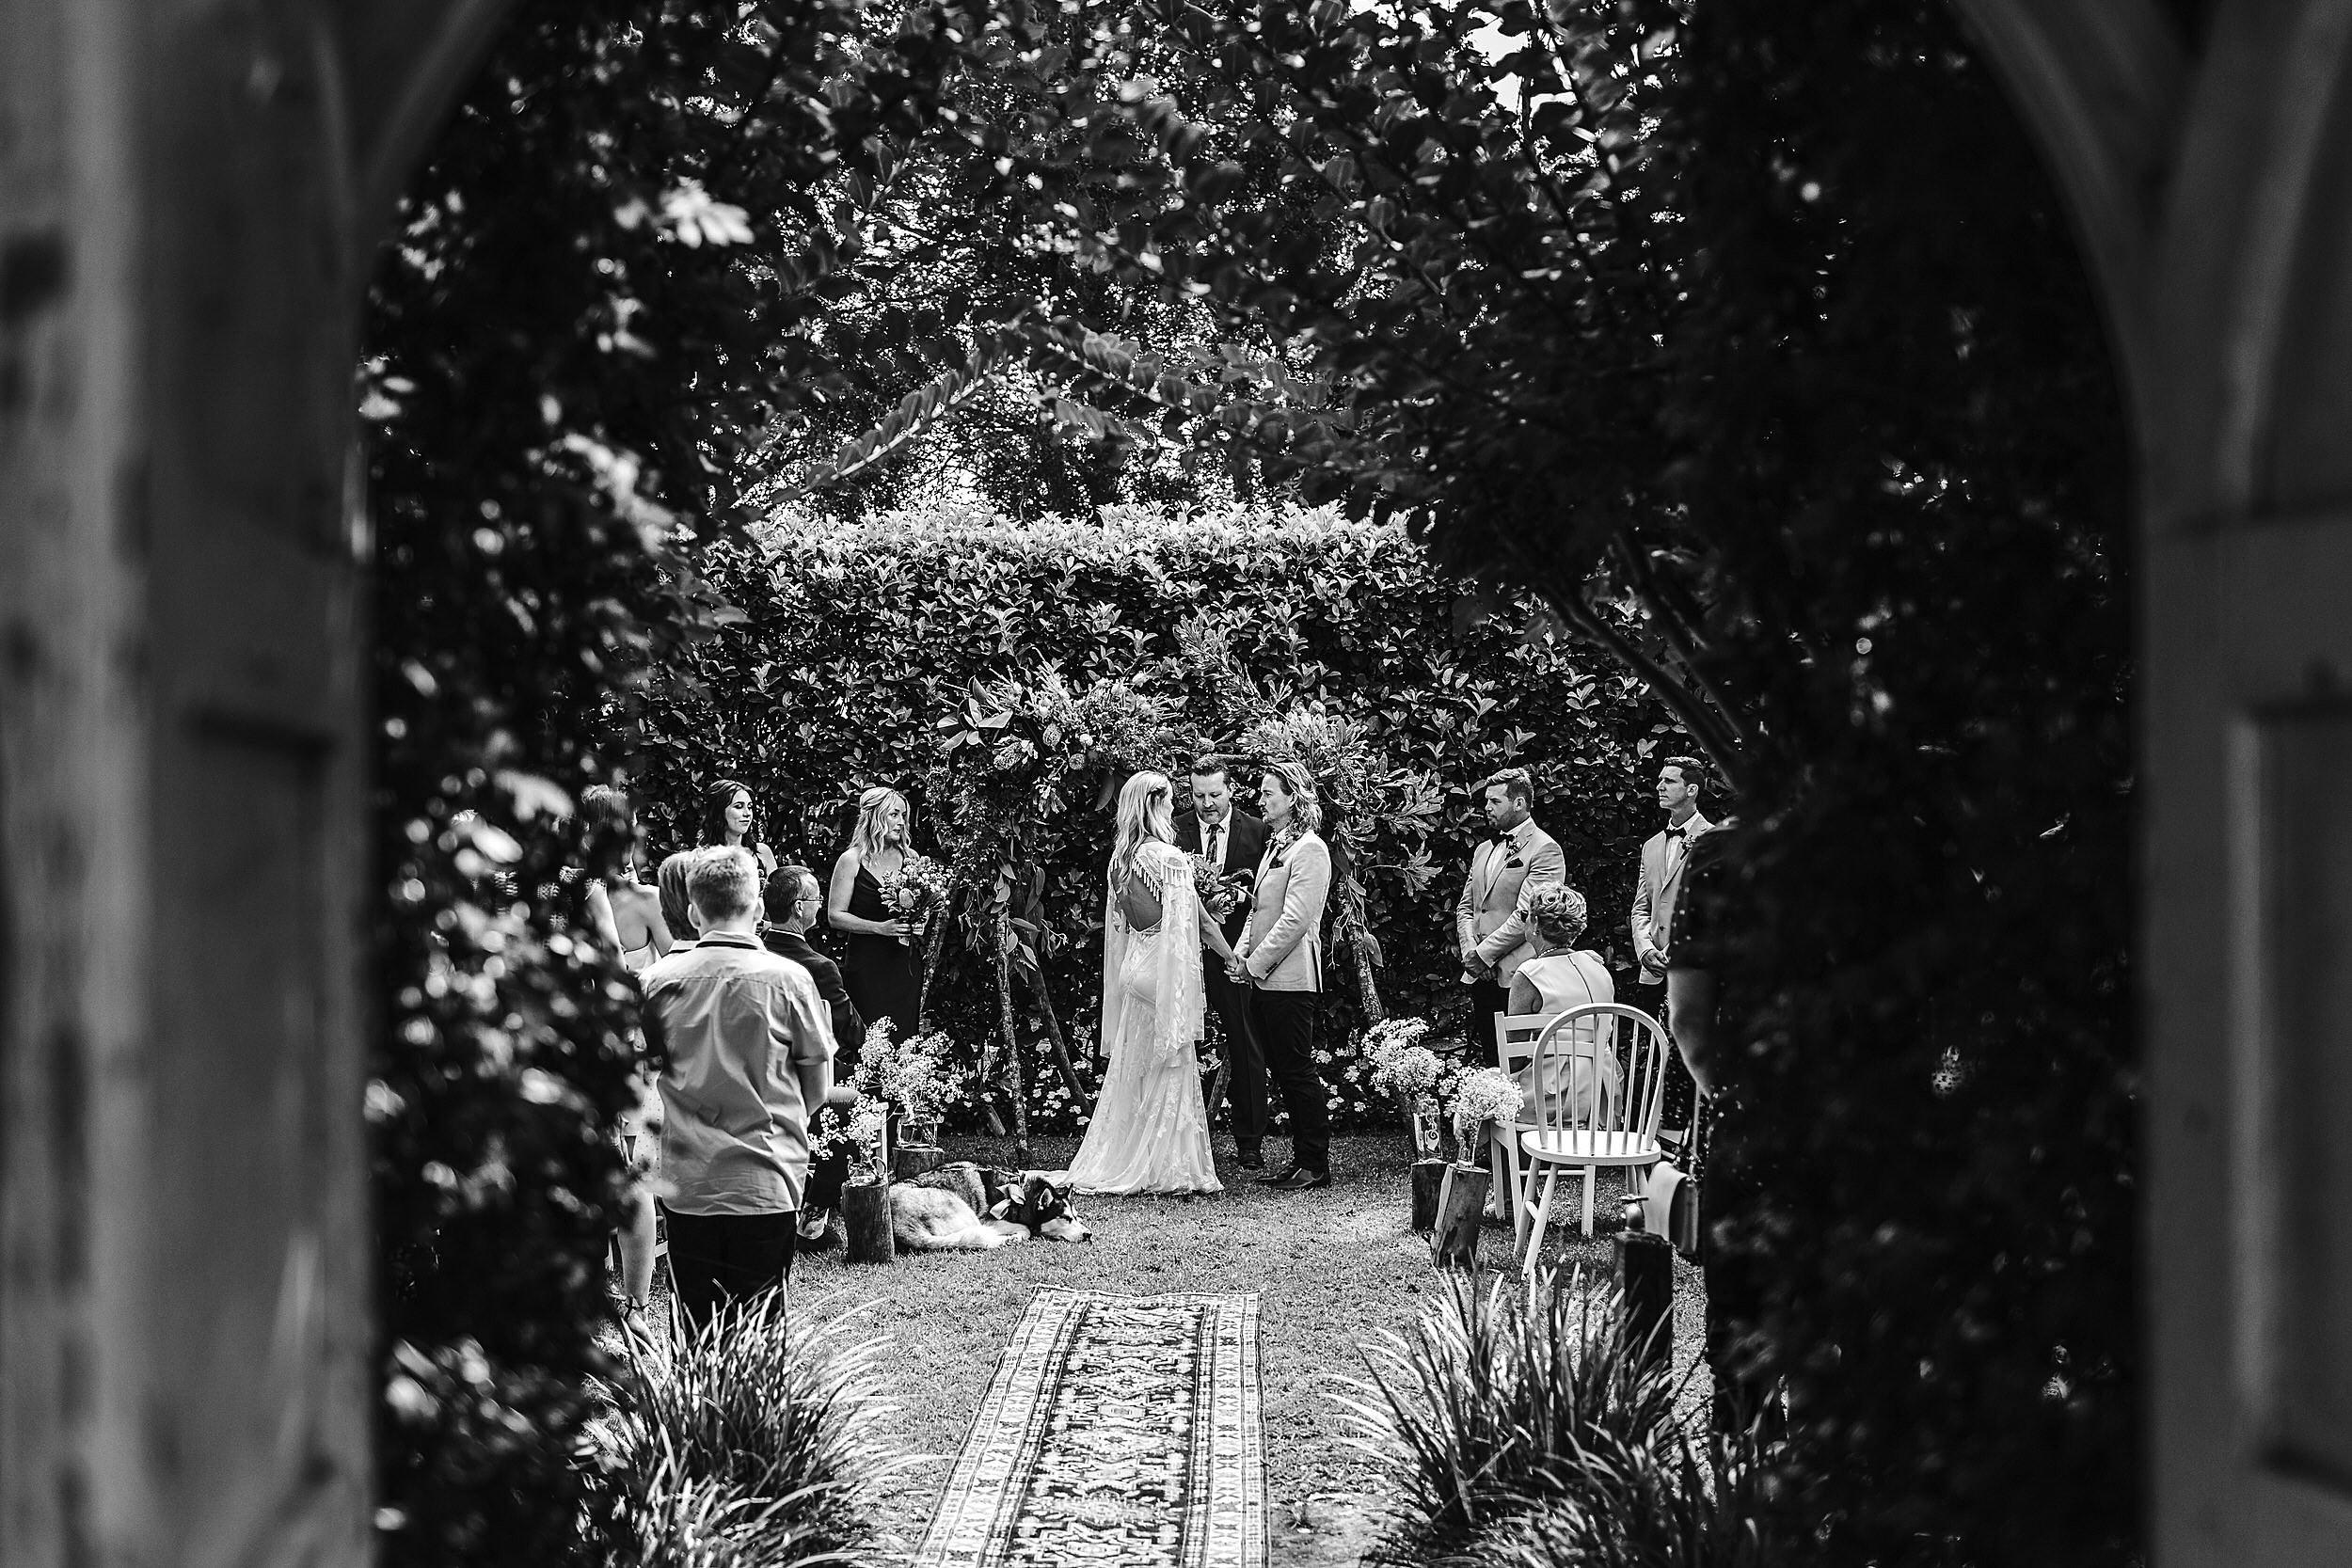 wedding_the_woolshed_steph_zac_0100.jpg